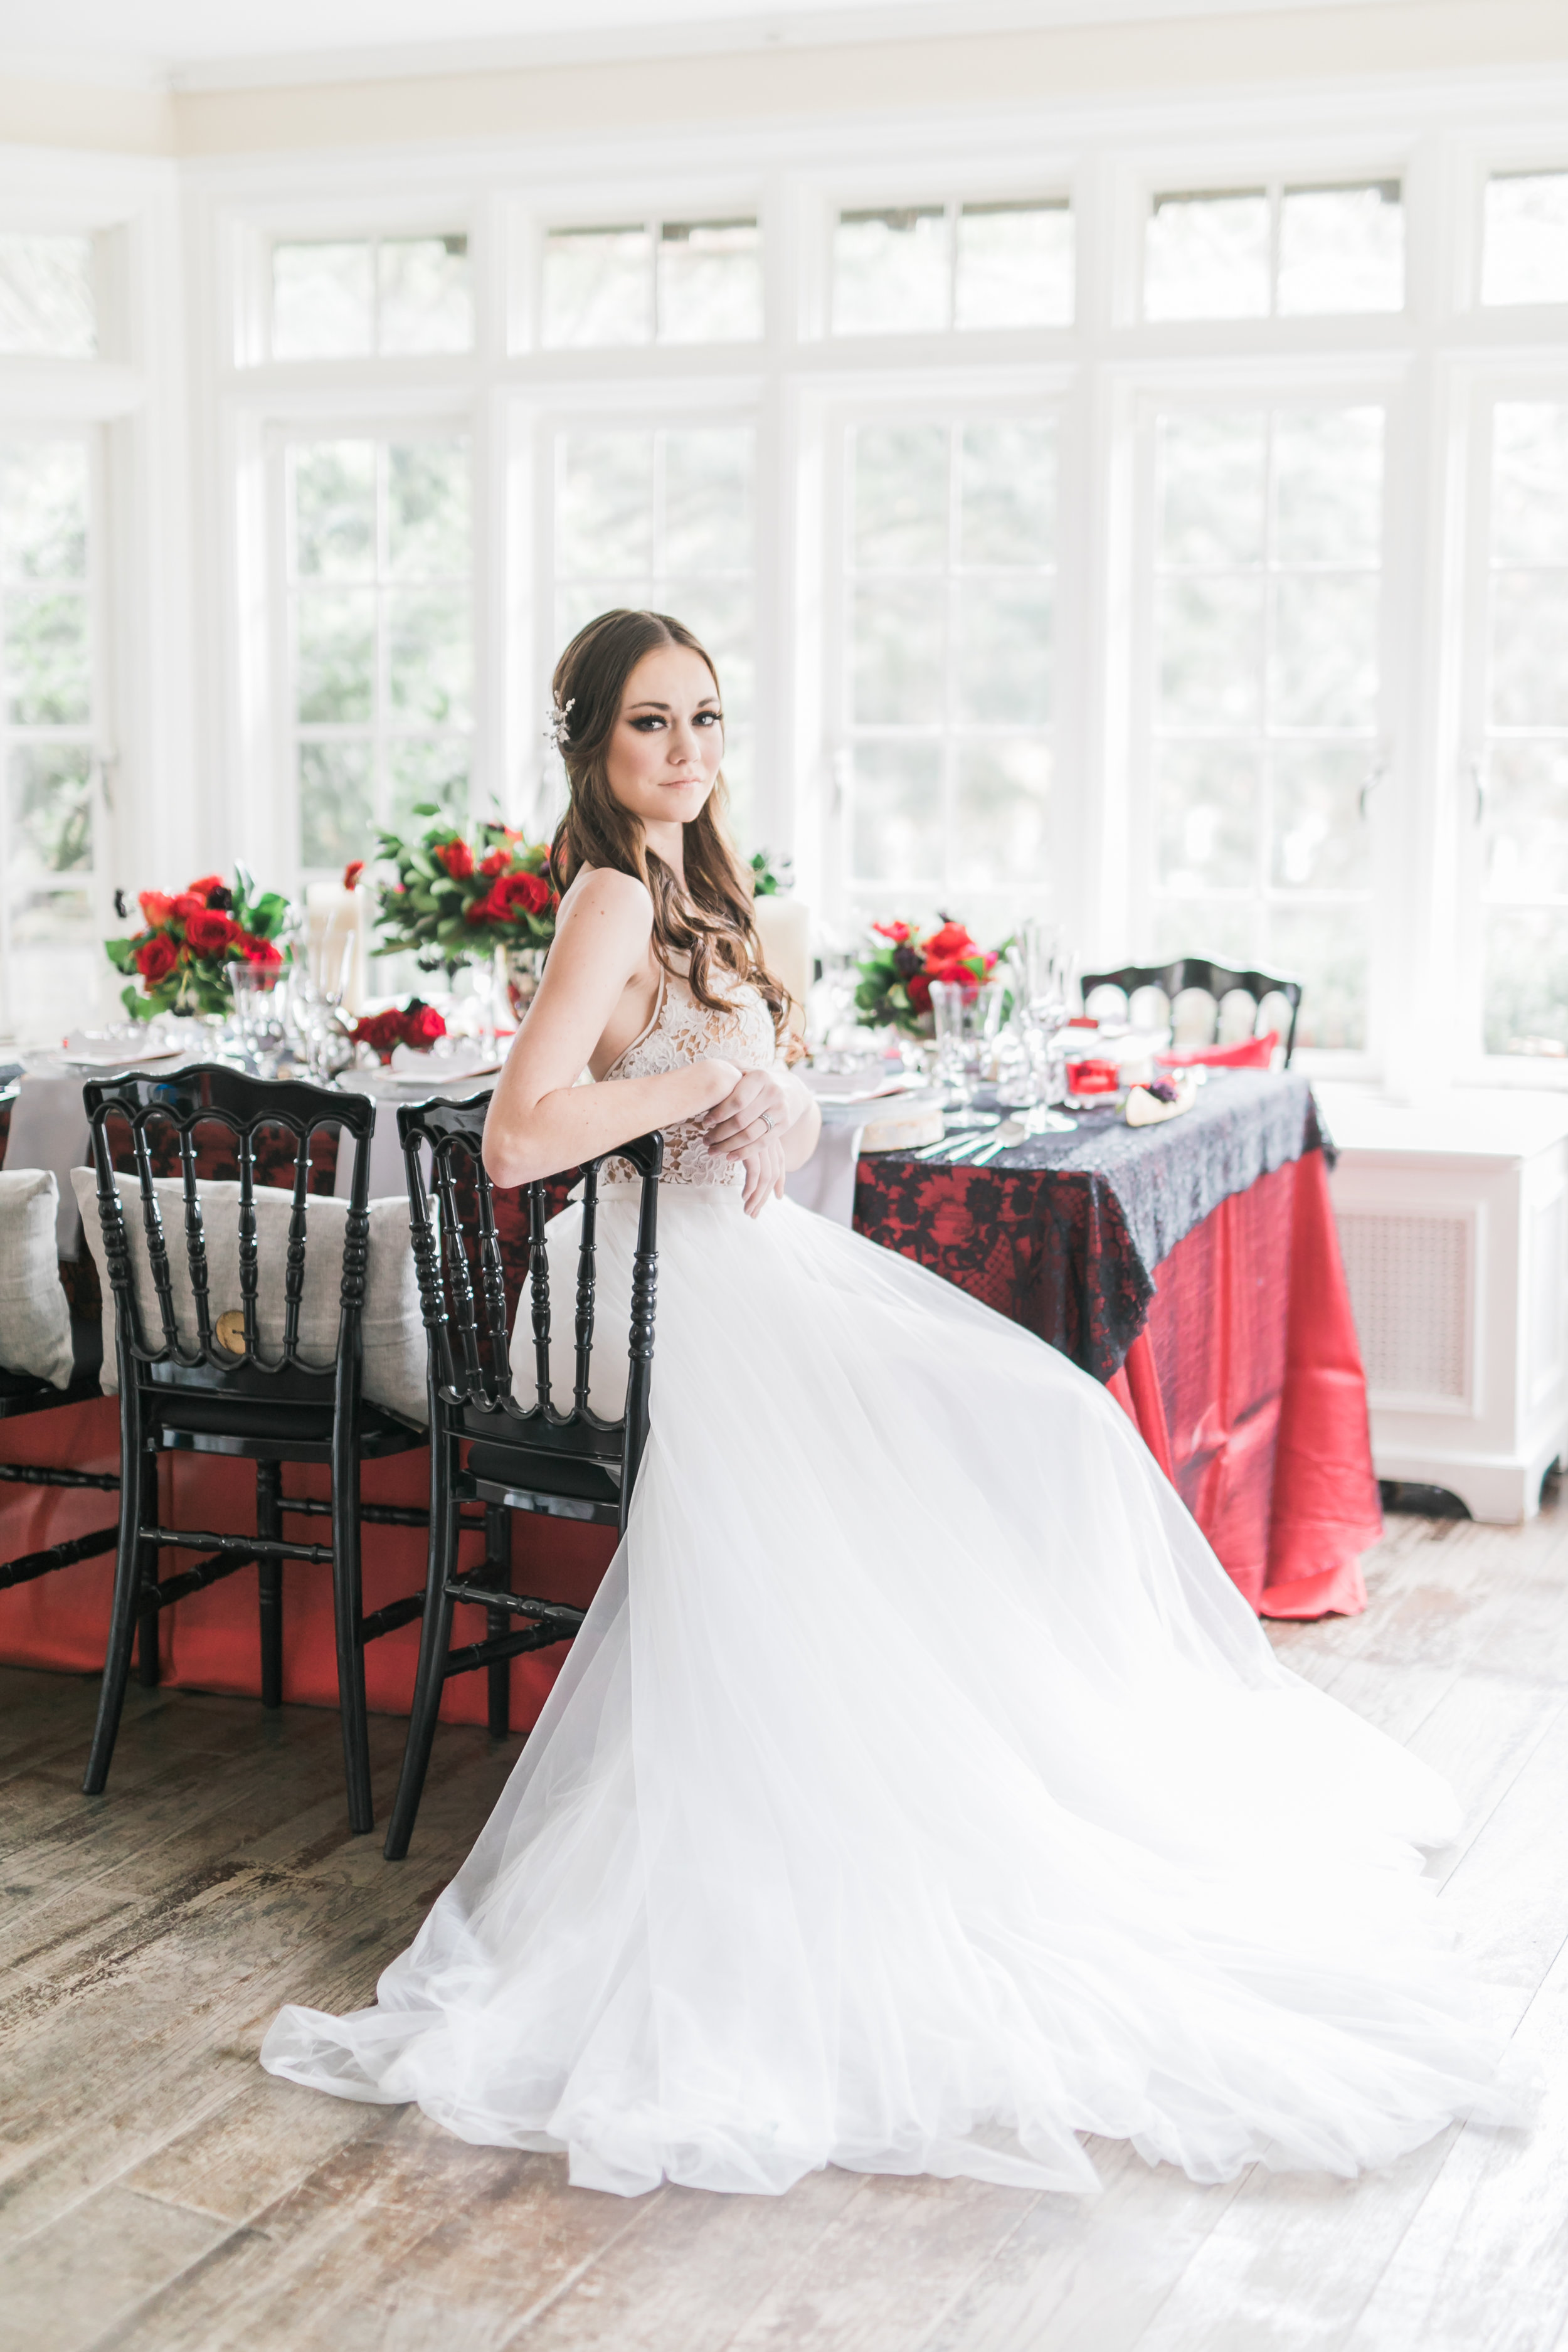 Canadian_black_red_silver_wedding_editorial_shoot-152.jpg